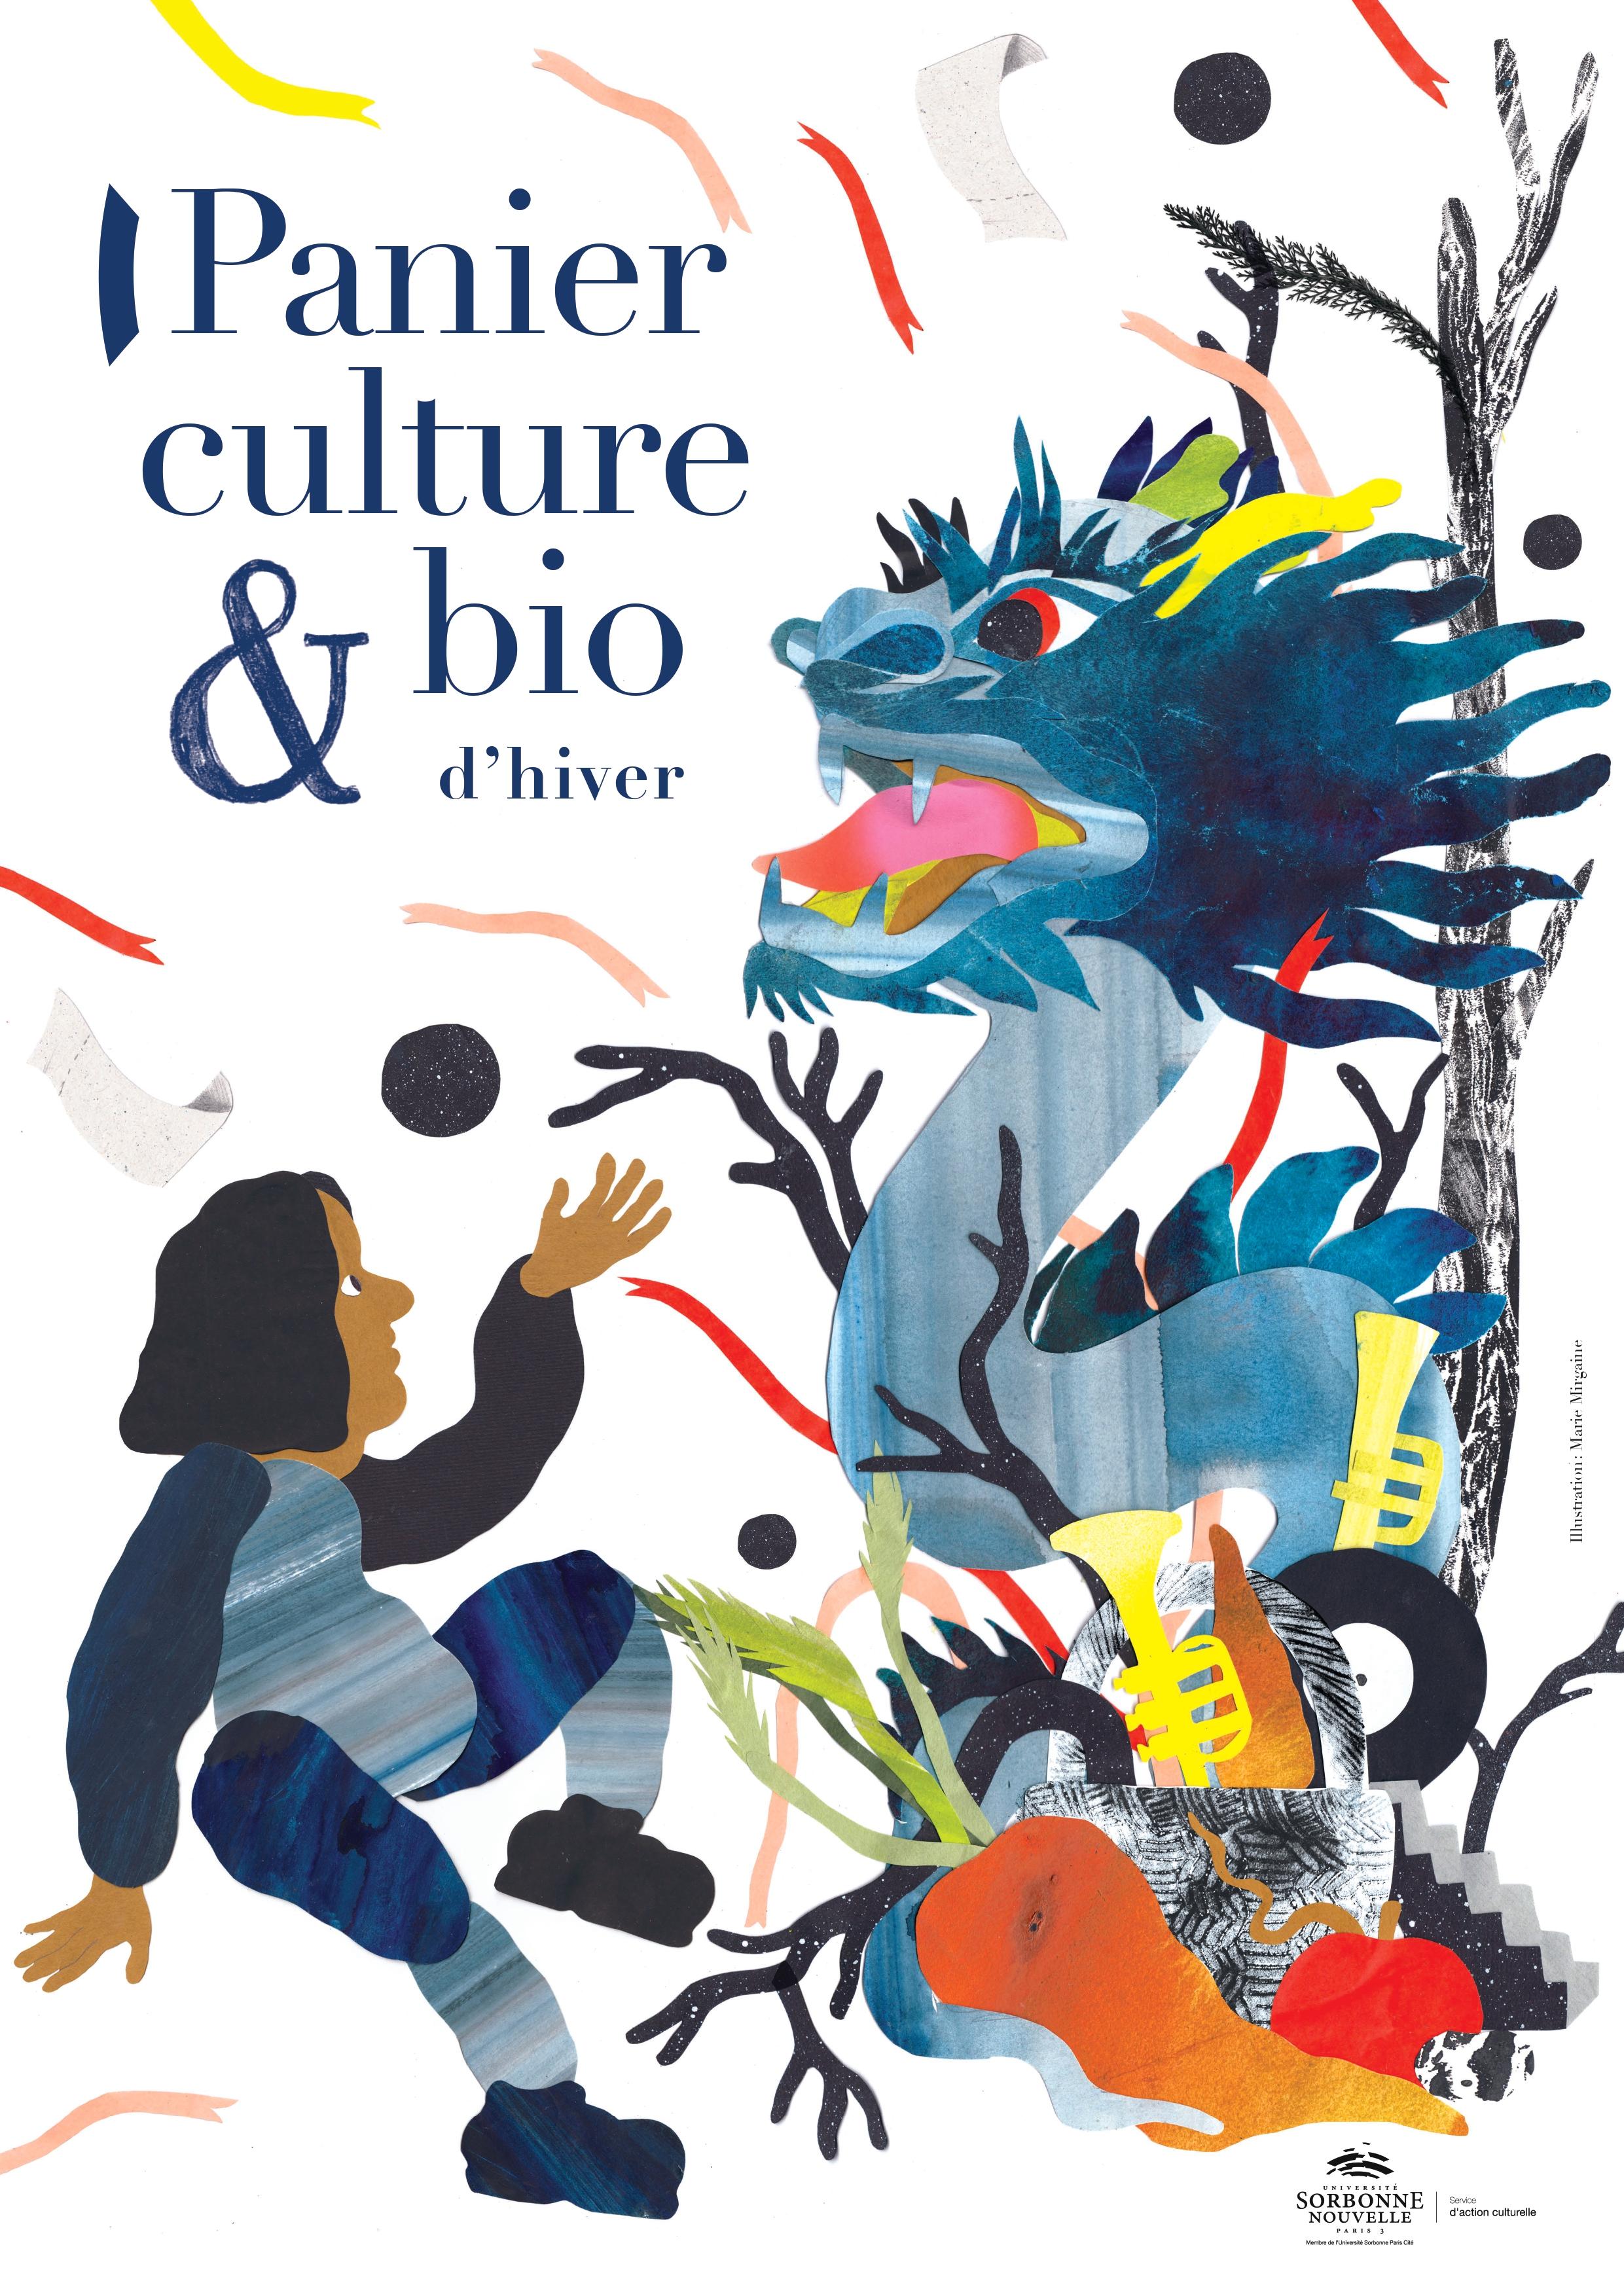 Affiches panier culture & bio hiver.jpg